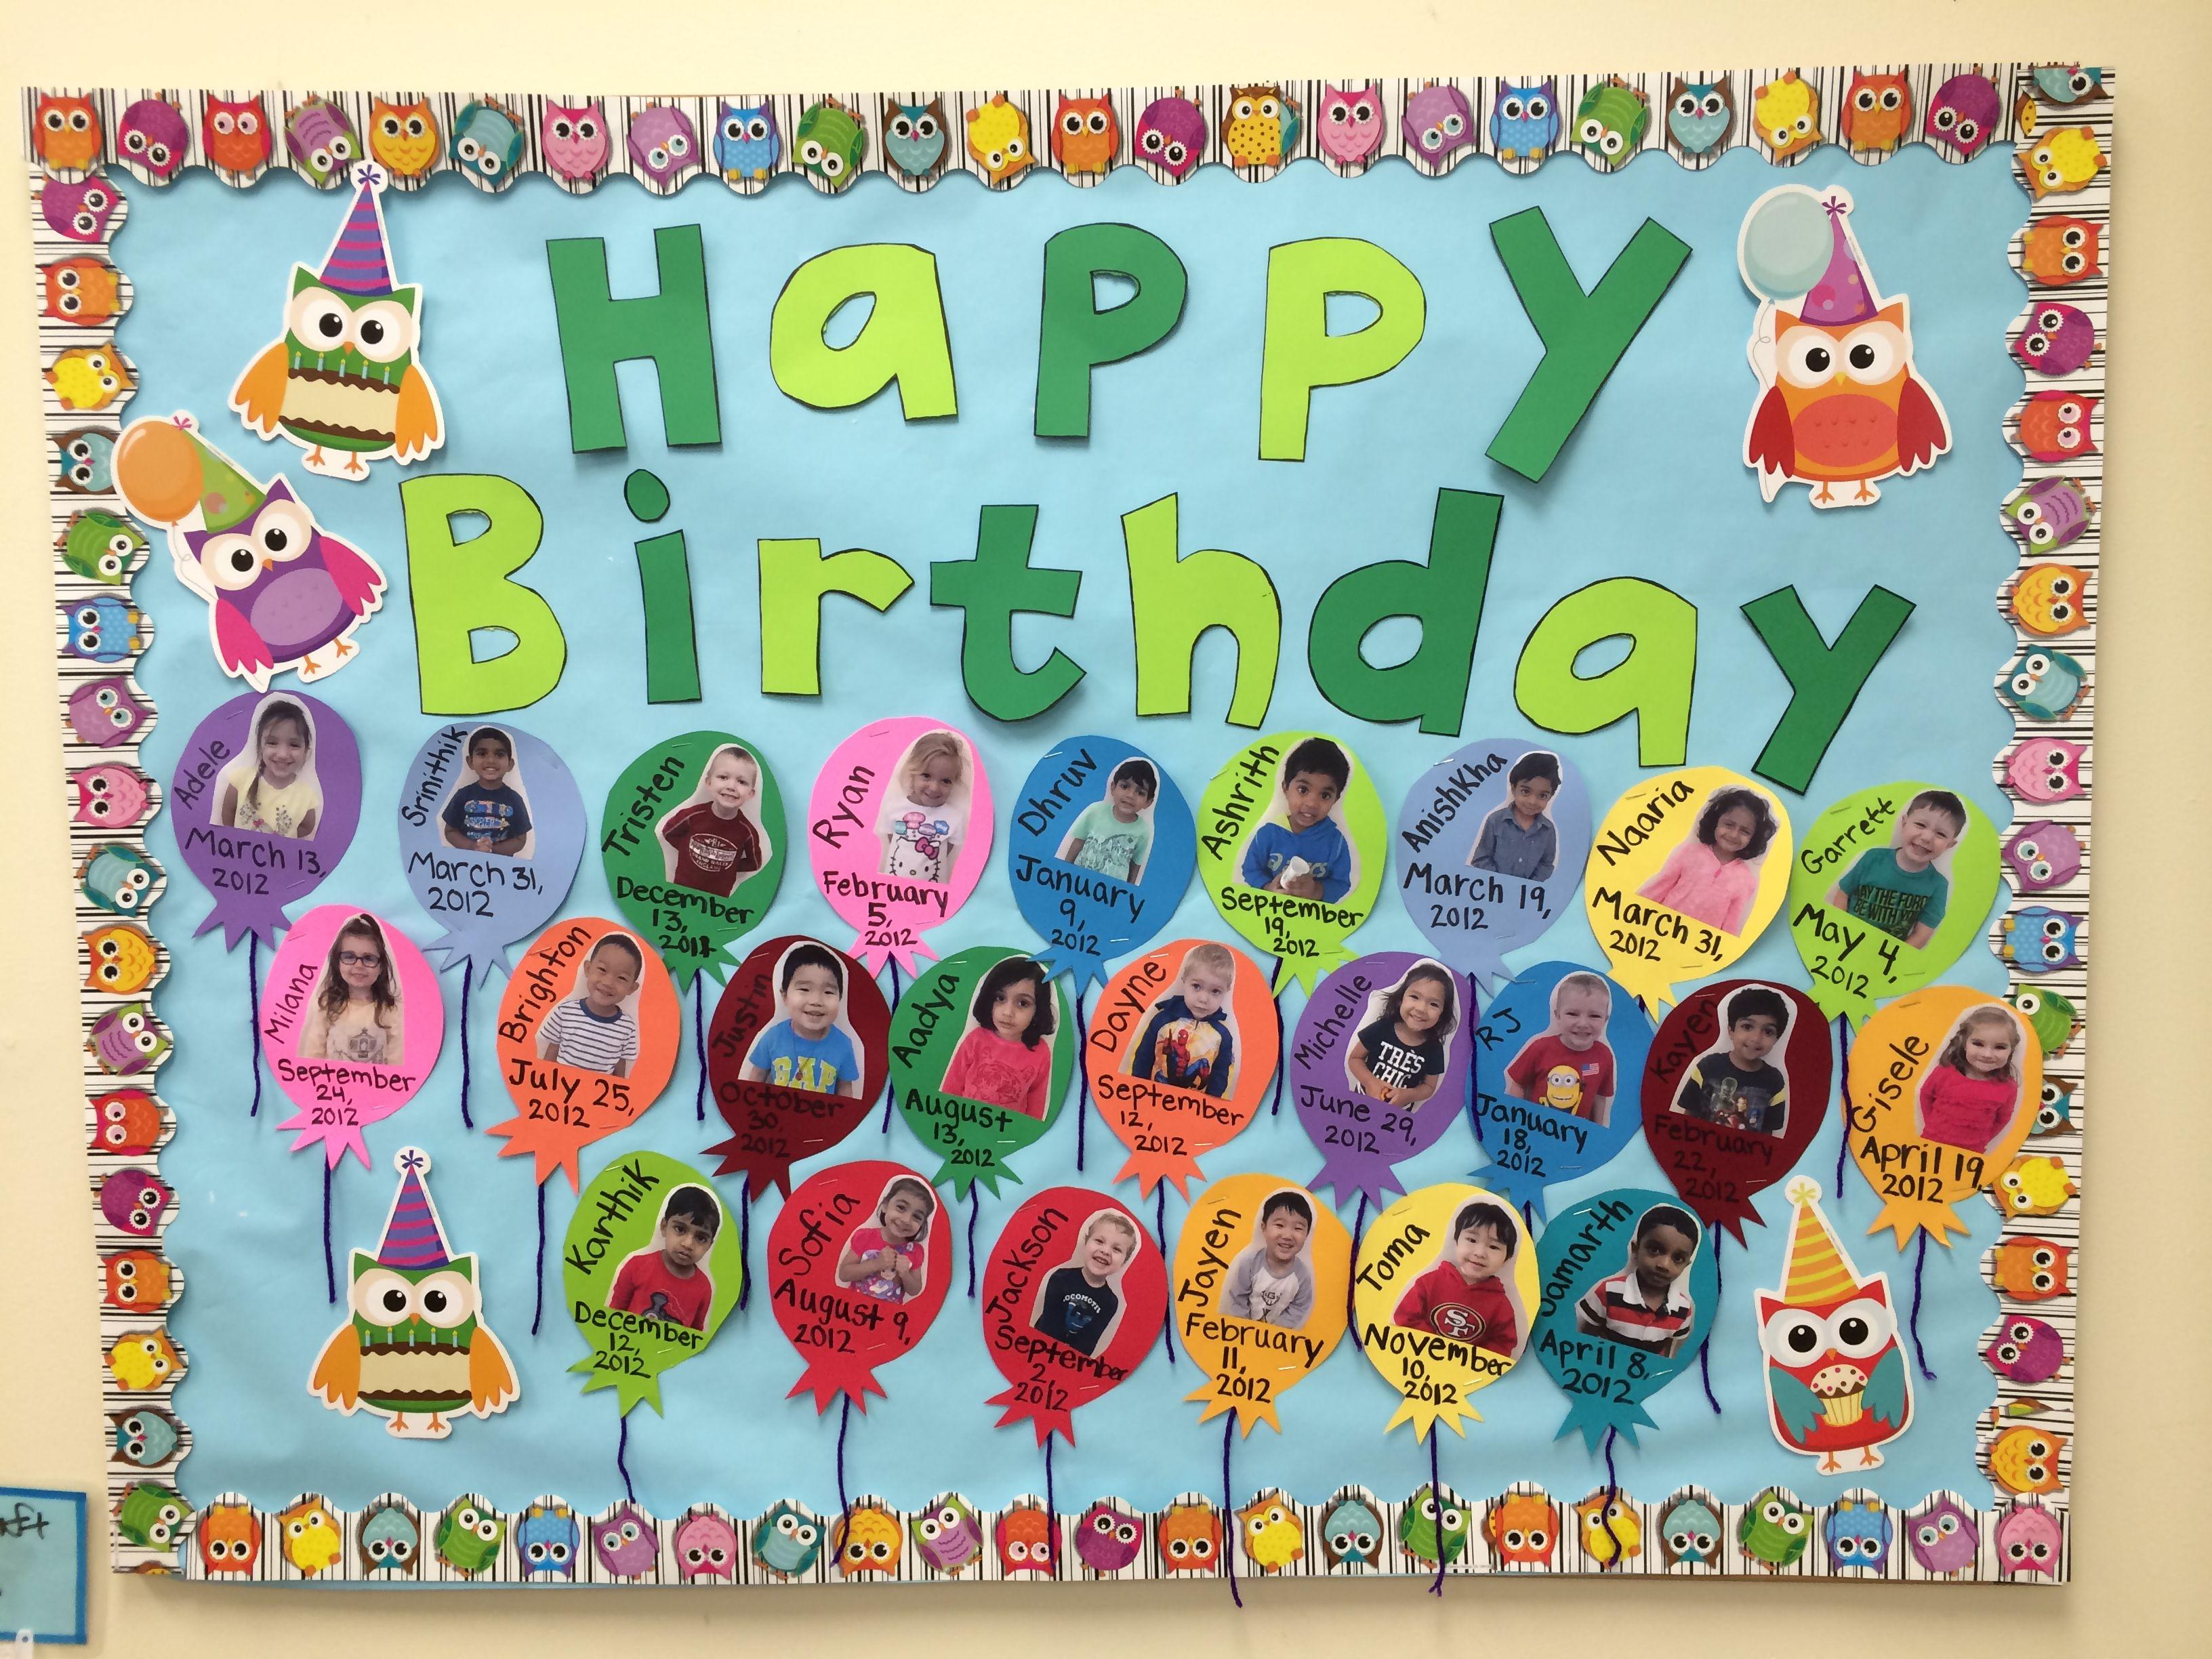 Preschool Birthday Board The Children Love Seeing